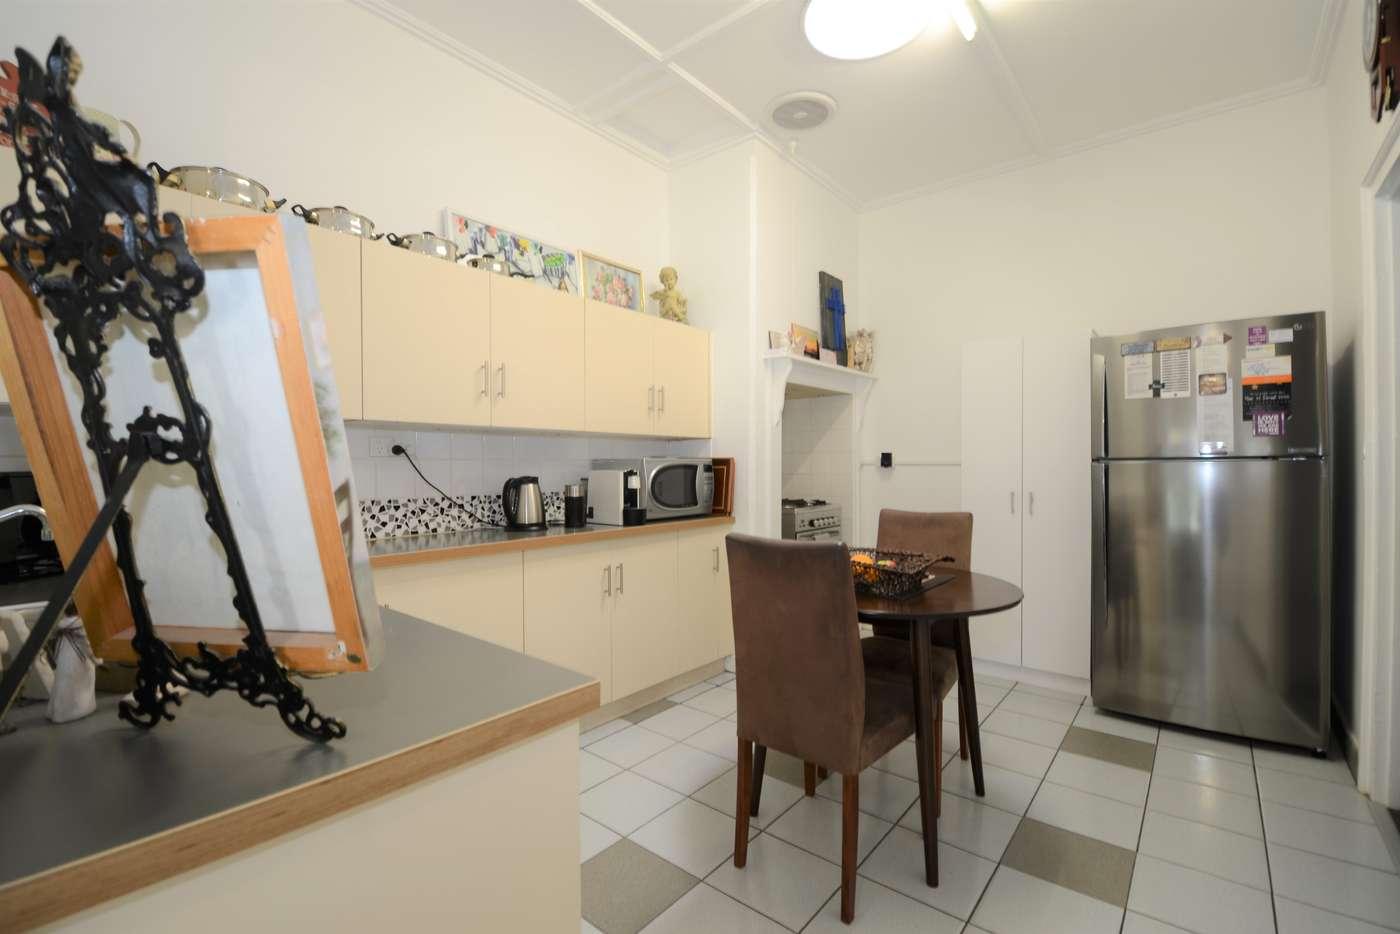 Sixth view of Homely house listing, 16 Spad Street, Albert Park SA 5014